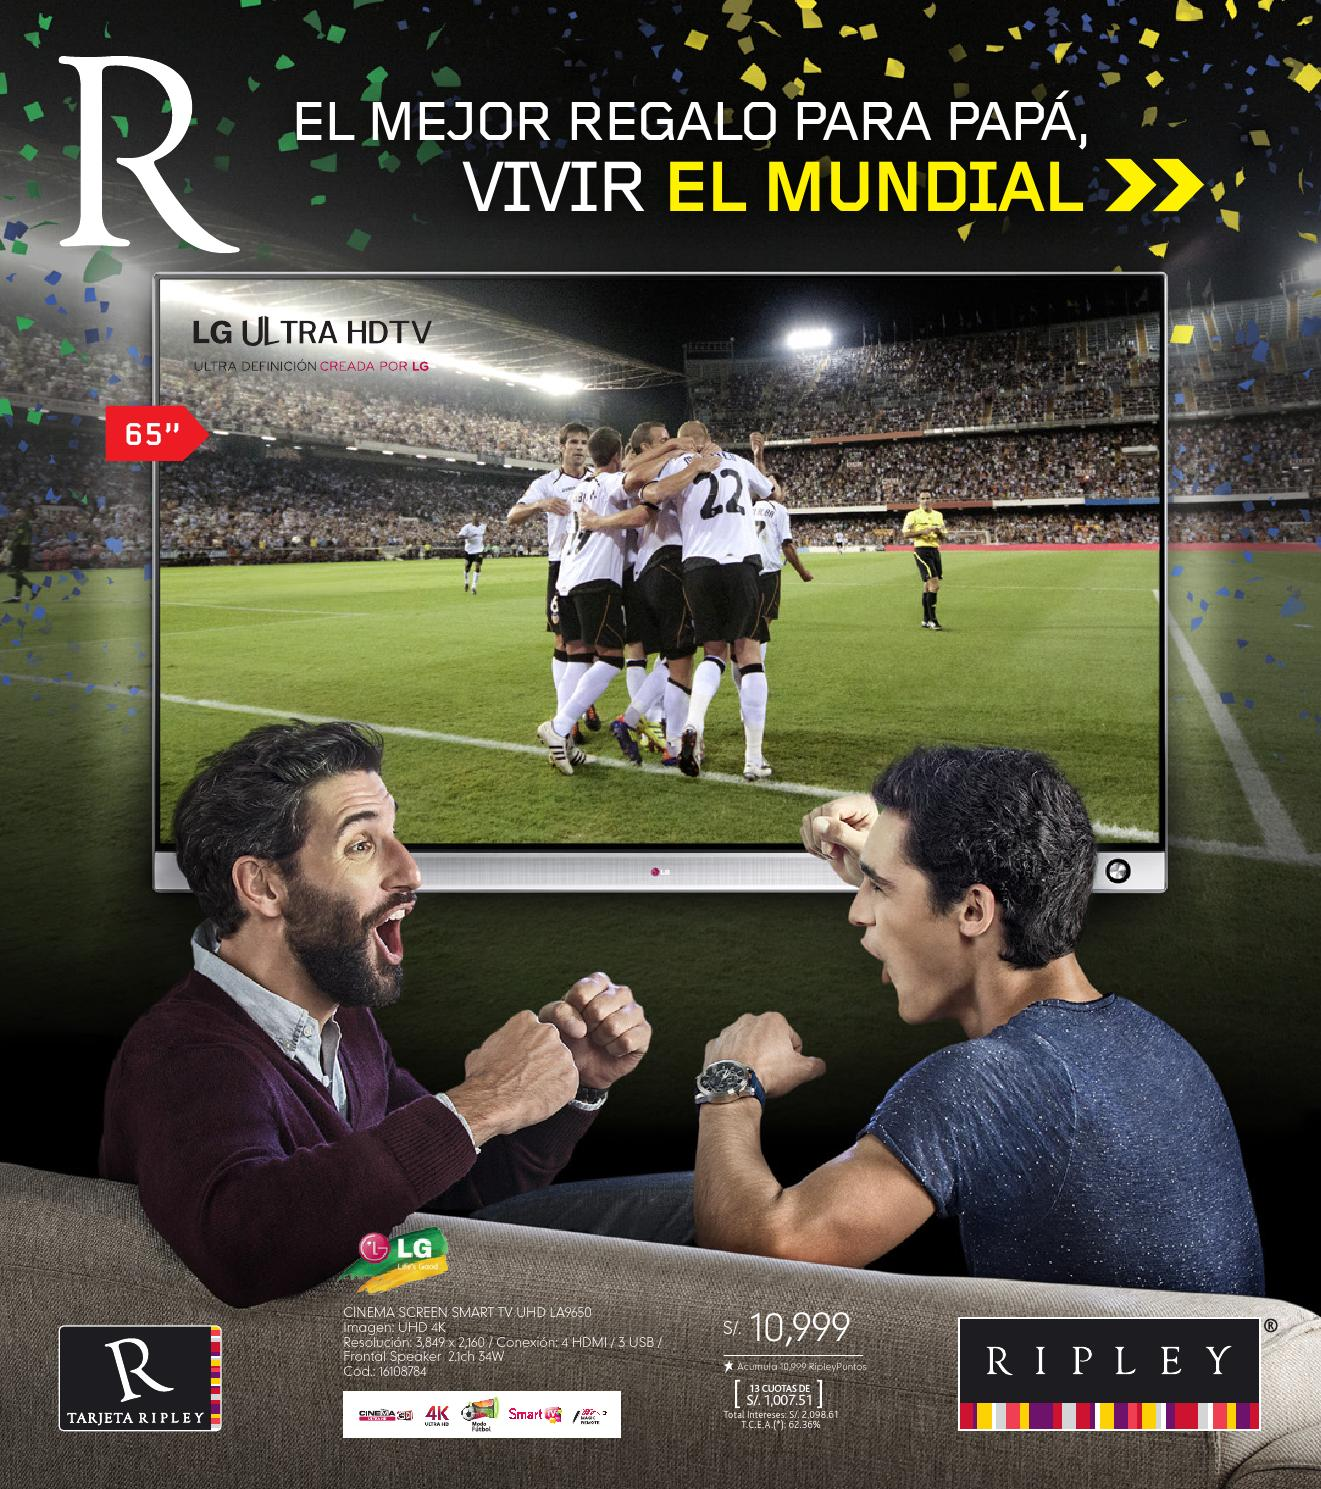 Me fascina mi papá- Especial Electro by Ripley Peru - issuu 4b8b373aca0cd